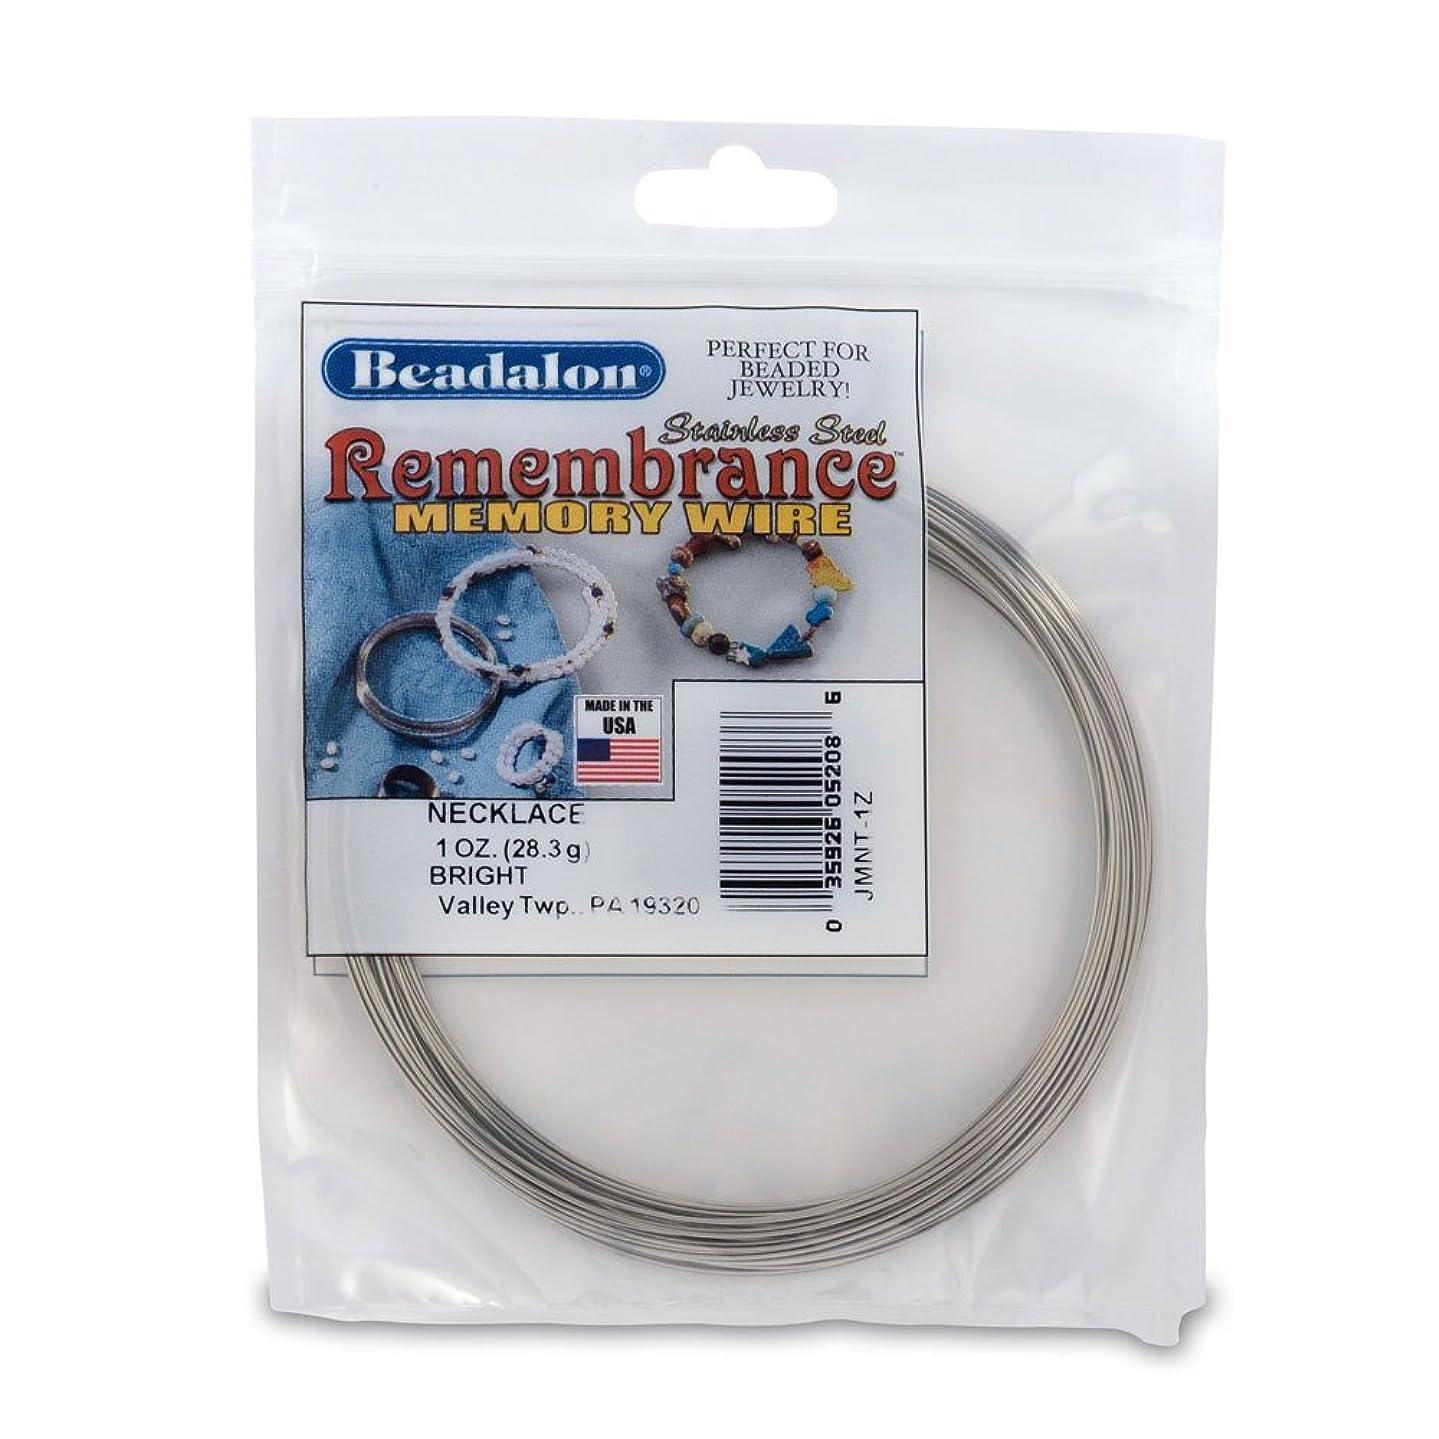 Beadalon Memory Wire Necklace Bright, 1-Ounce